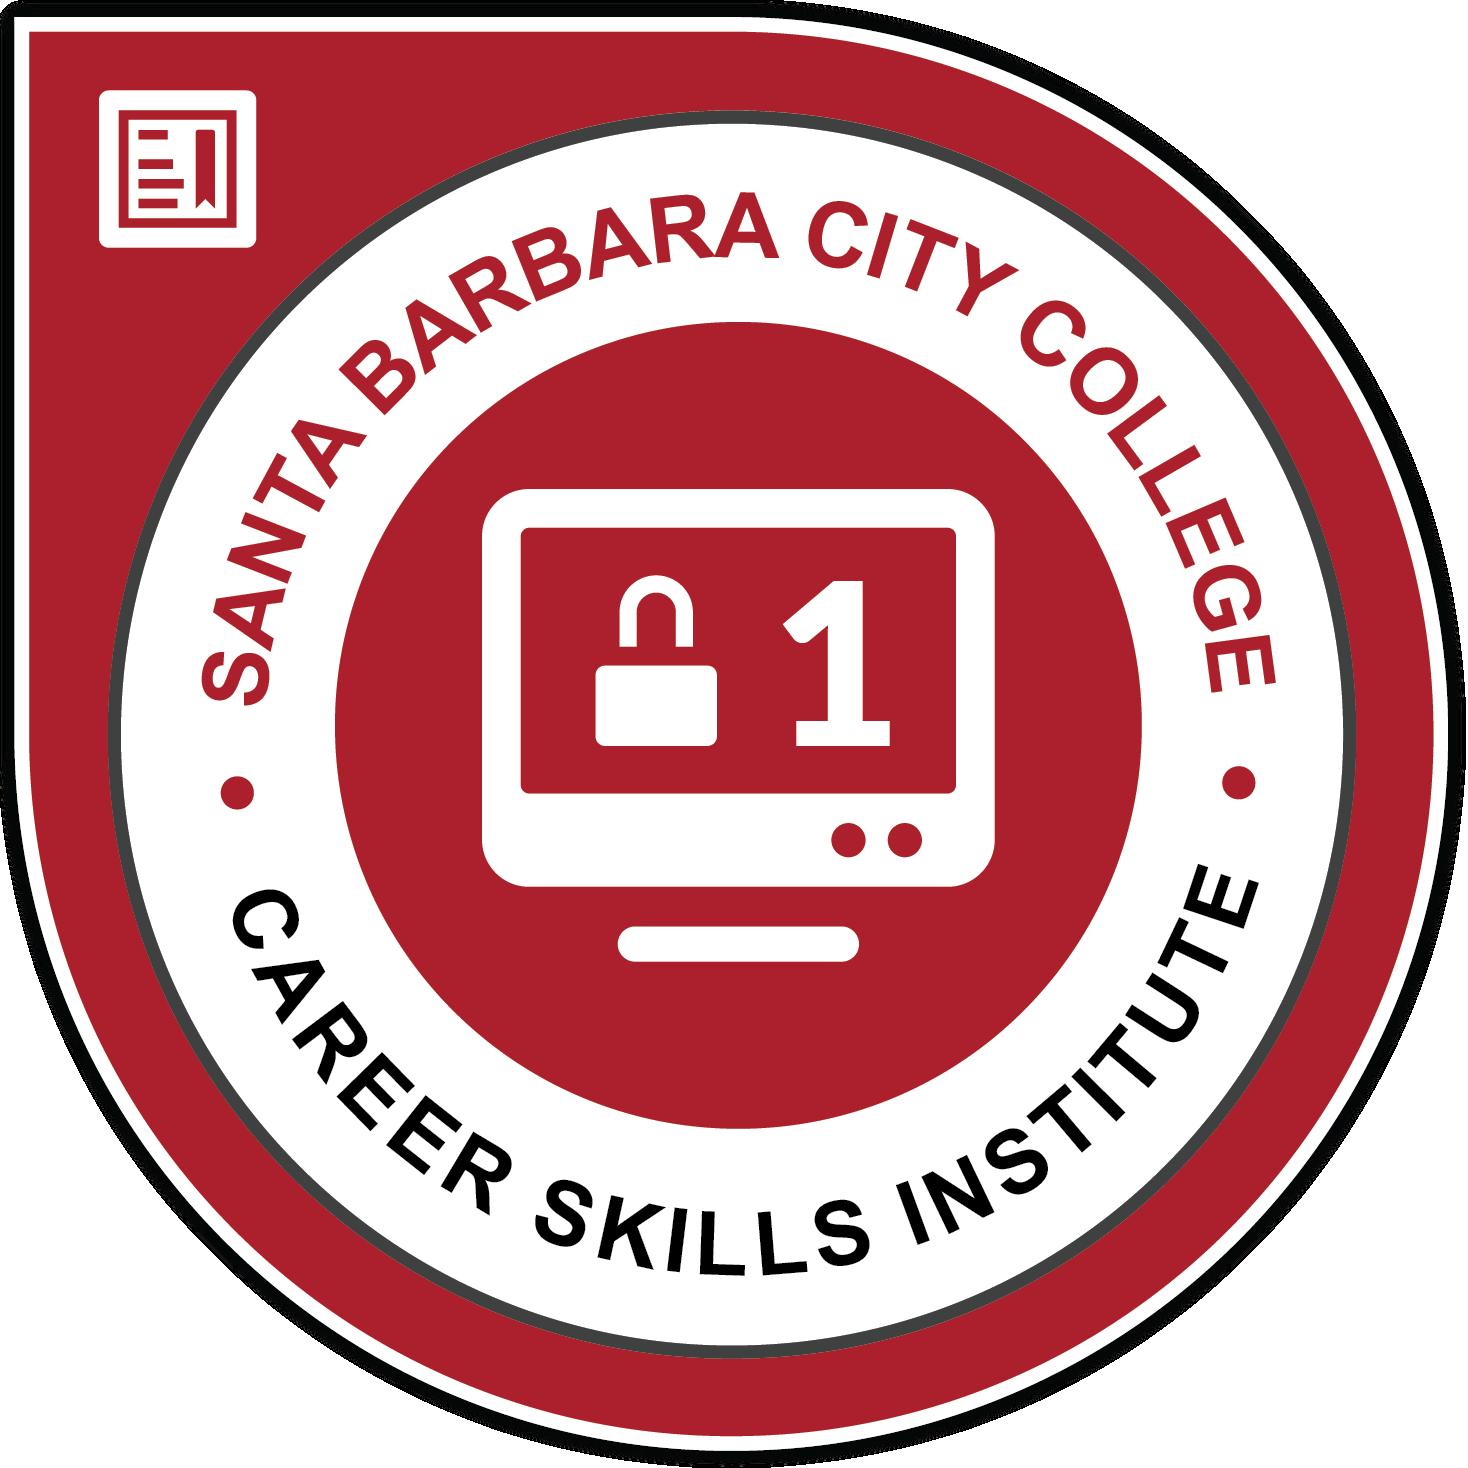 Computer Basic Skills Level 2